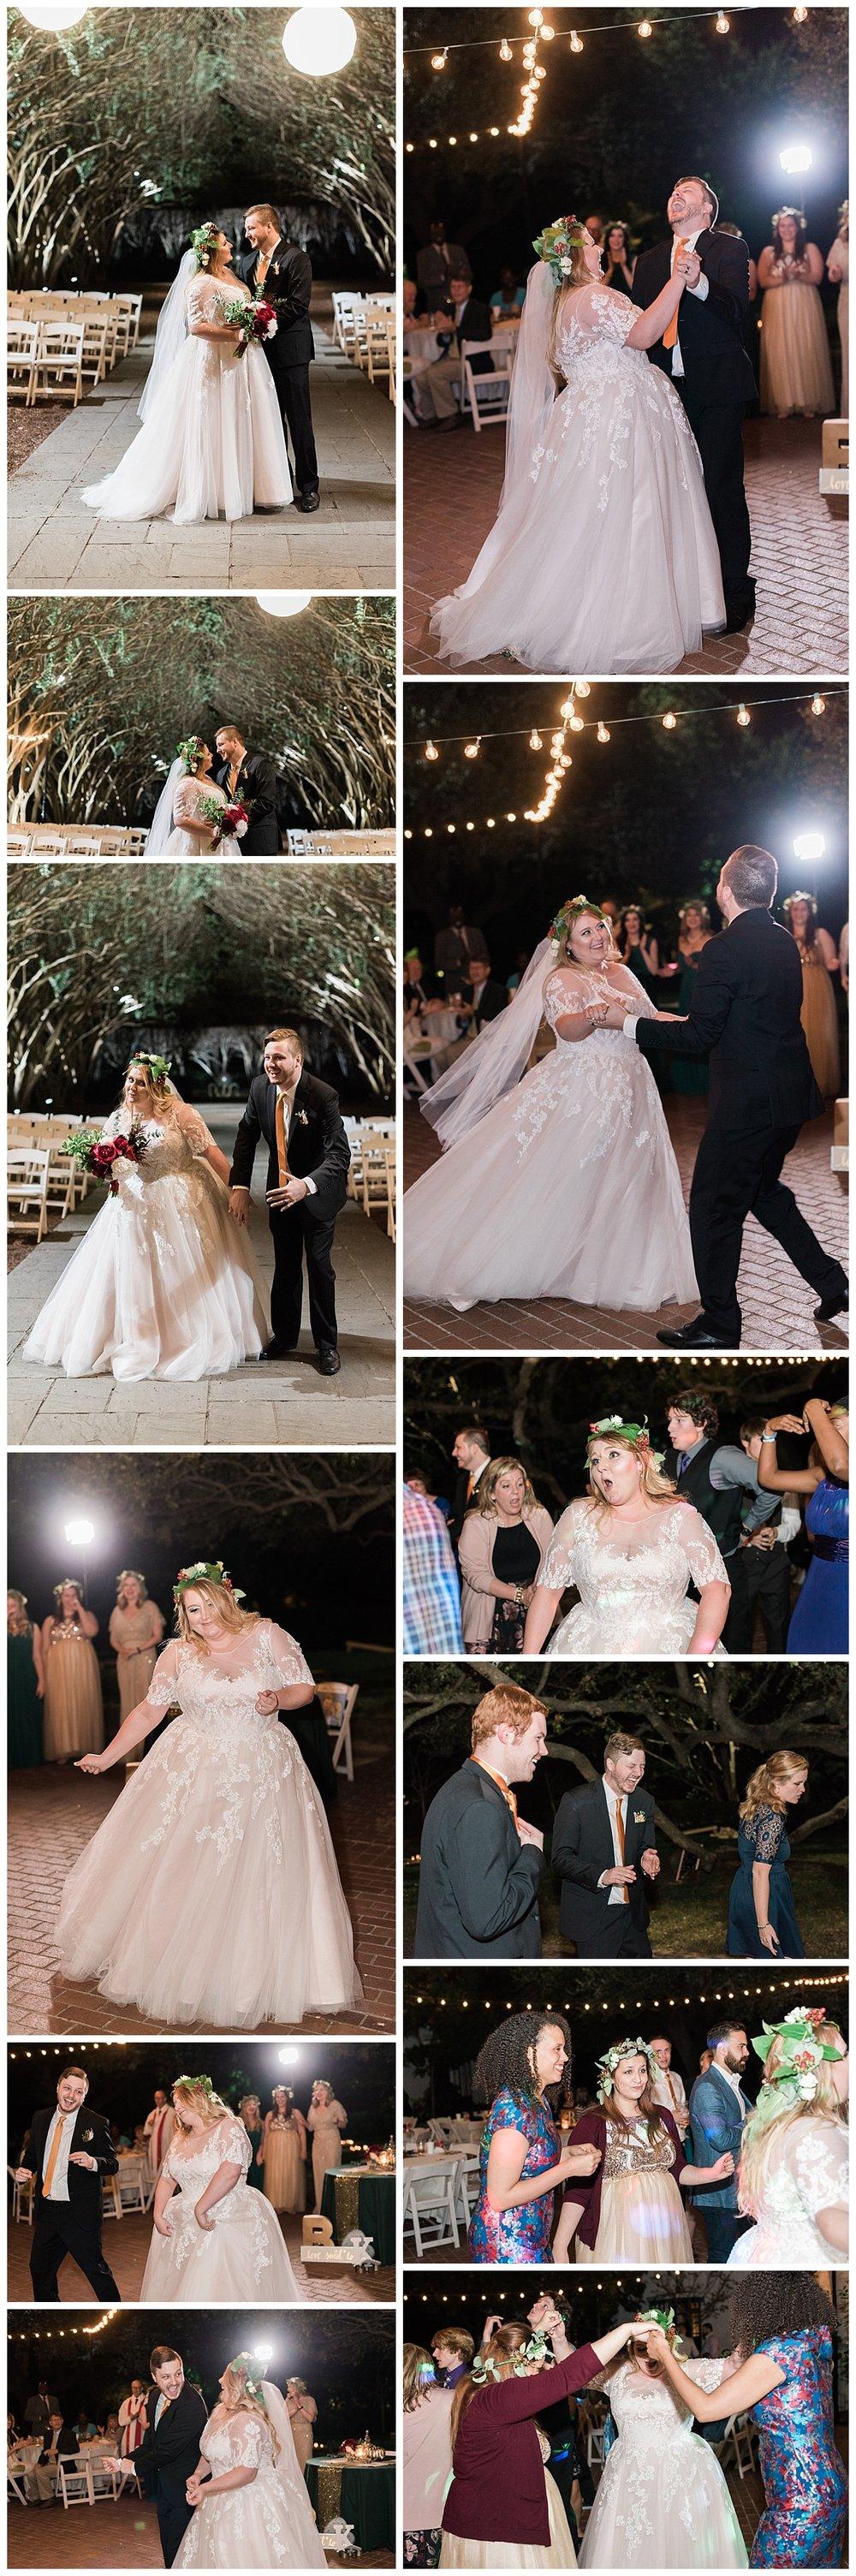 dallas-arboretum-and-botanical-garden-wedding-ar-photography-7.jpg